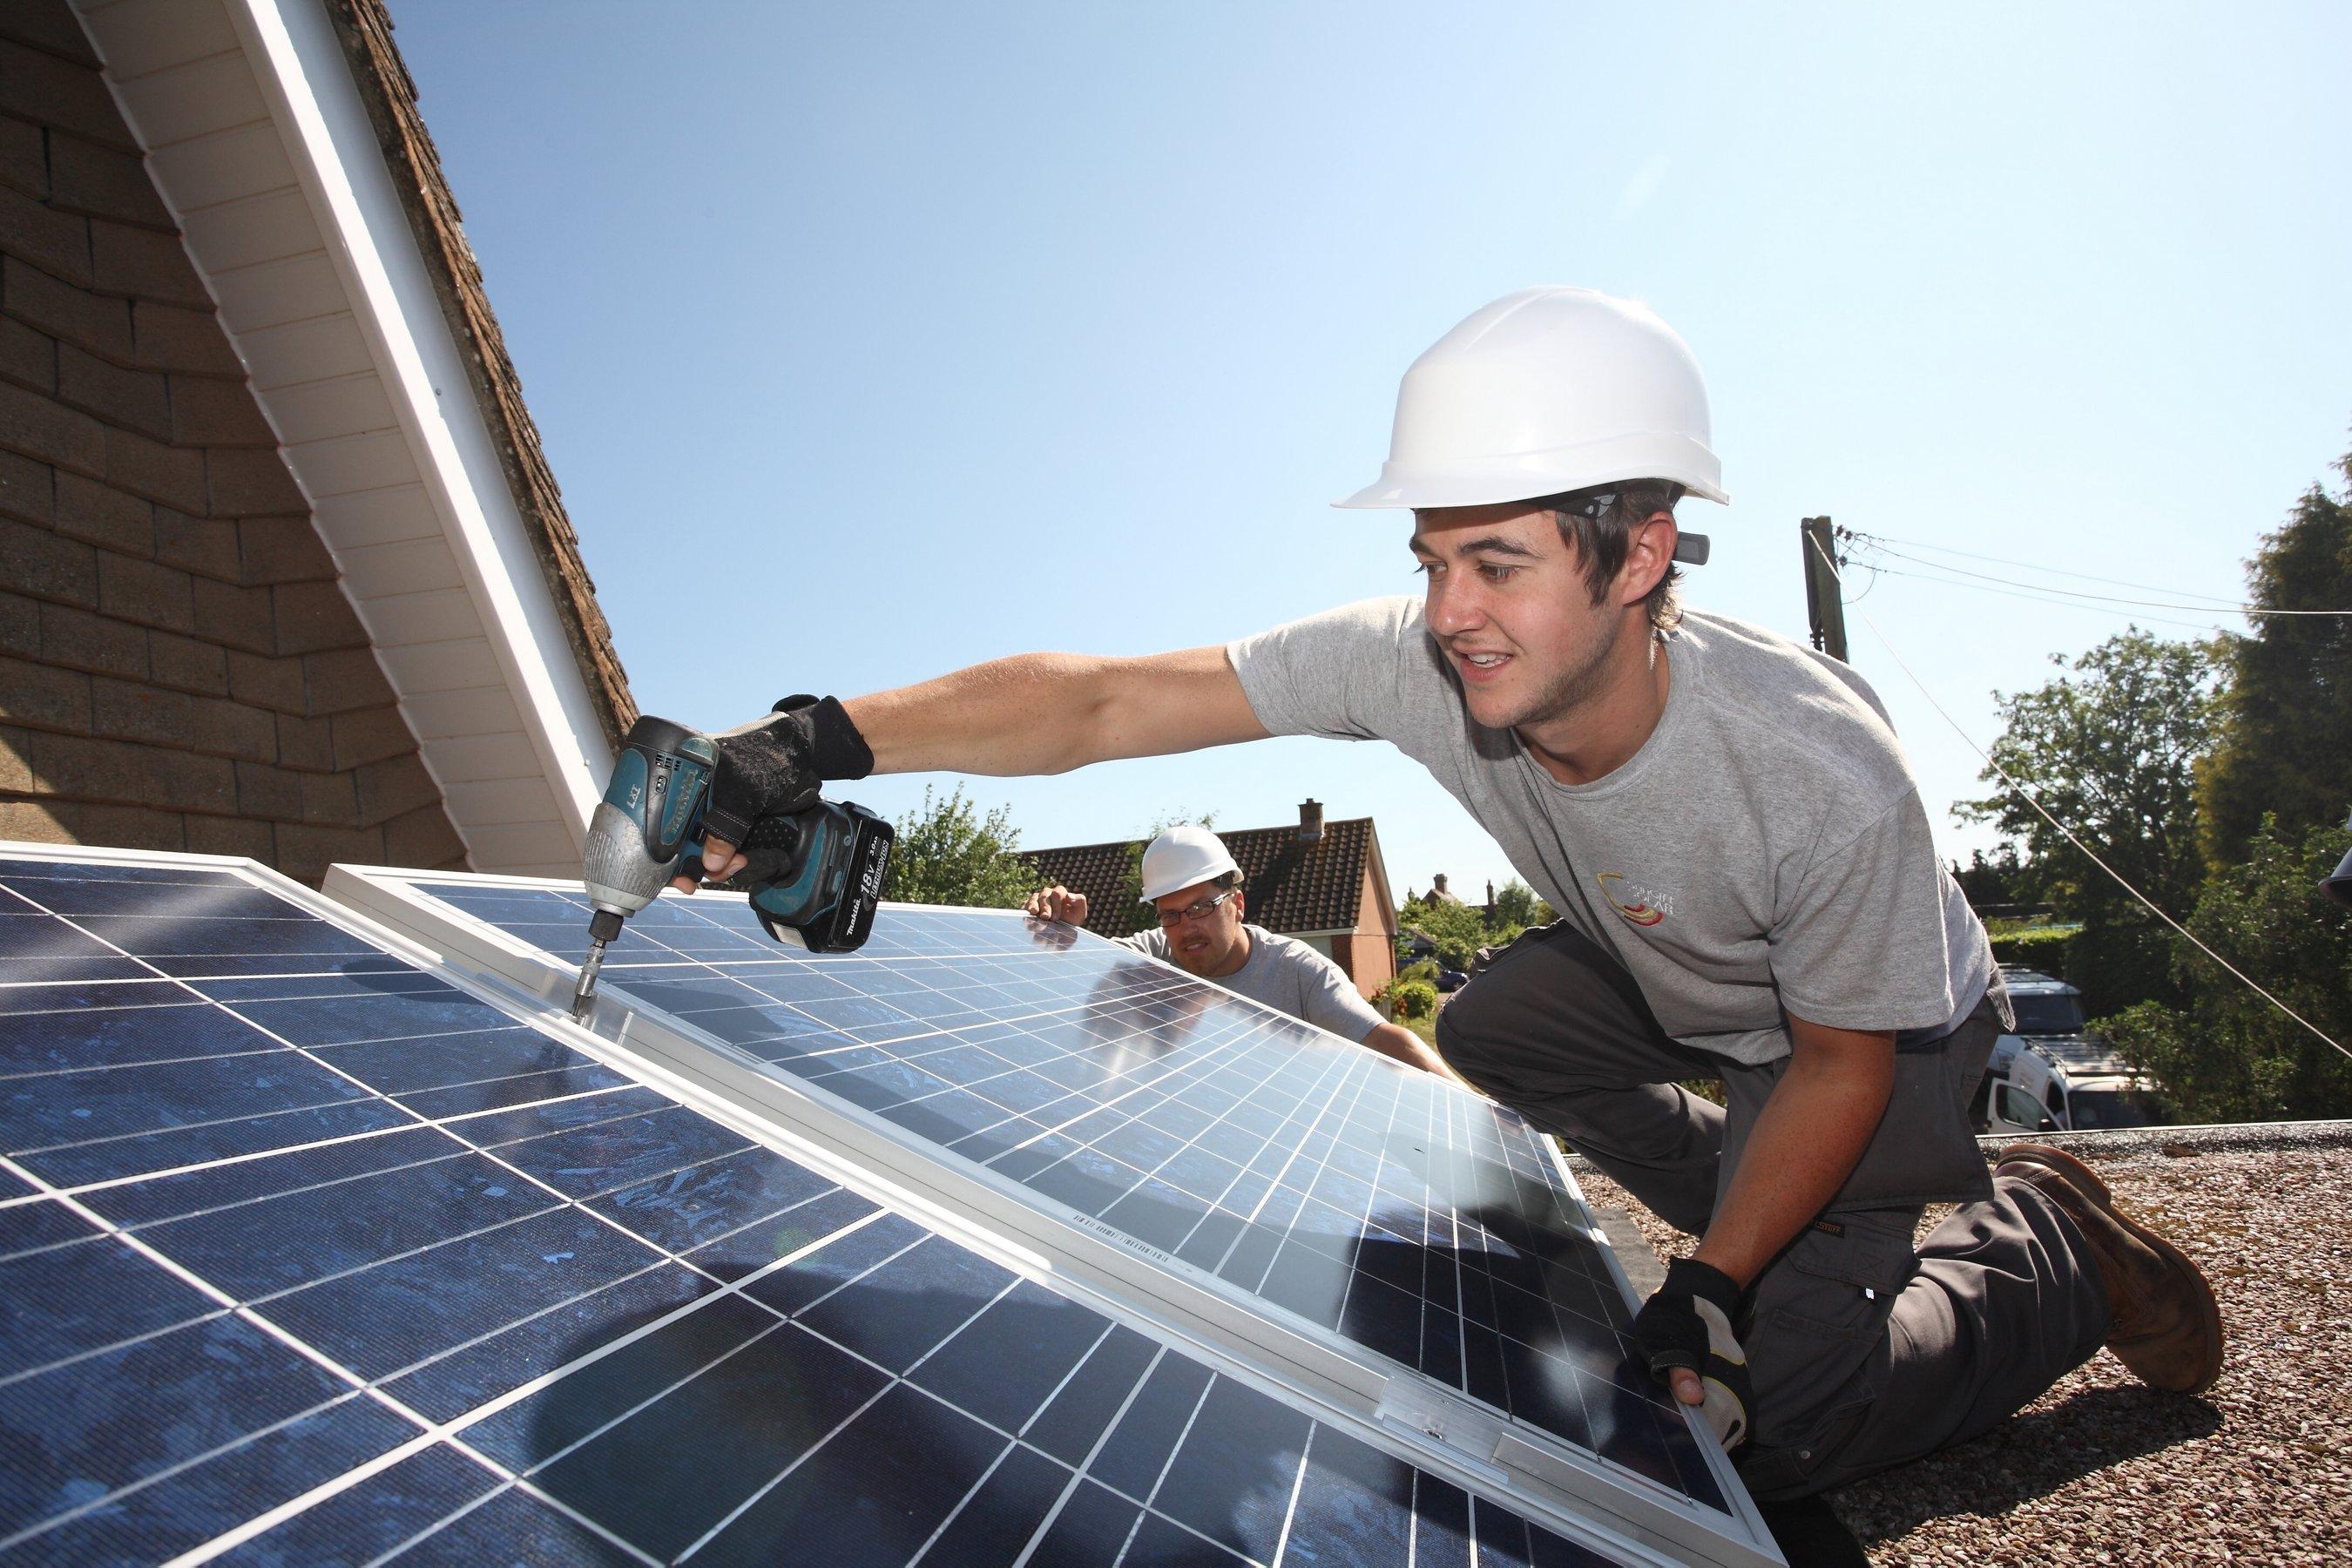 Image: SunGift Solar.